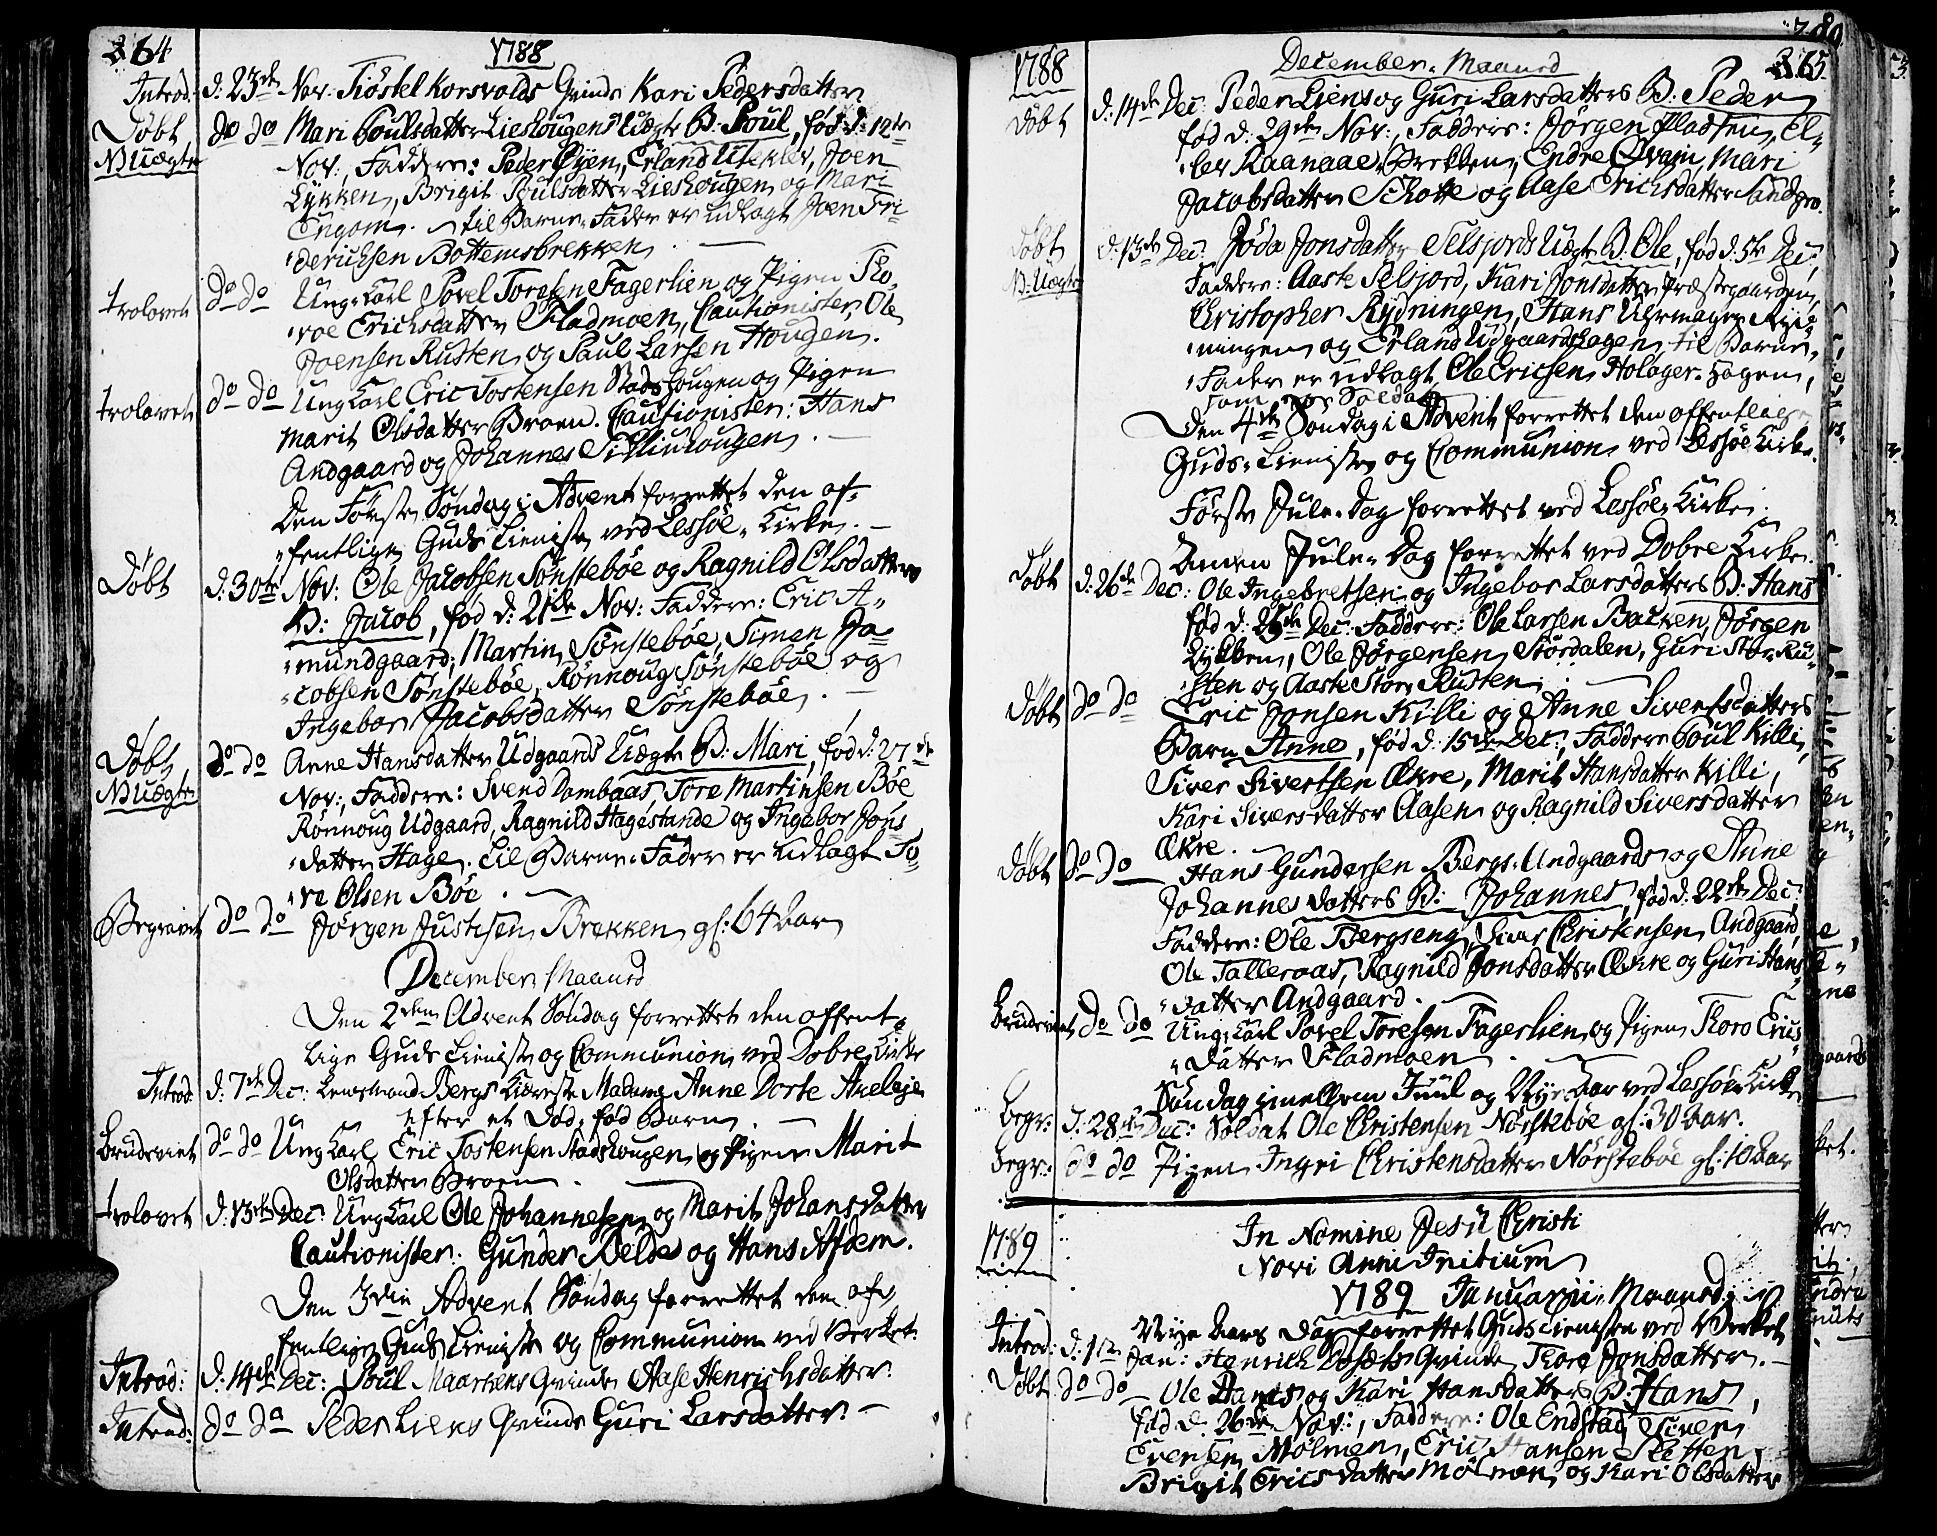 SAH, Lesja prestekontor, Ministerialbok nr. 3, 1777-1819, s. 264-265